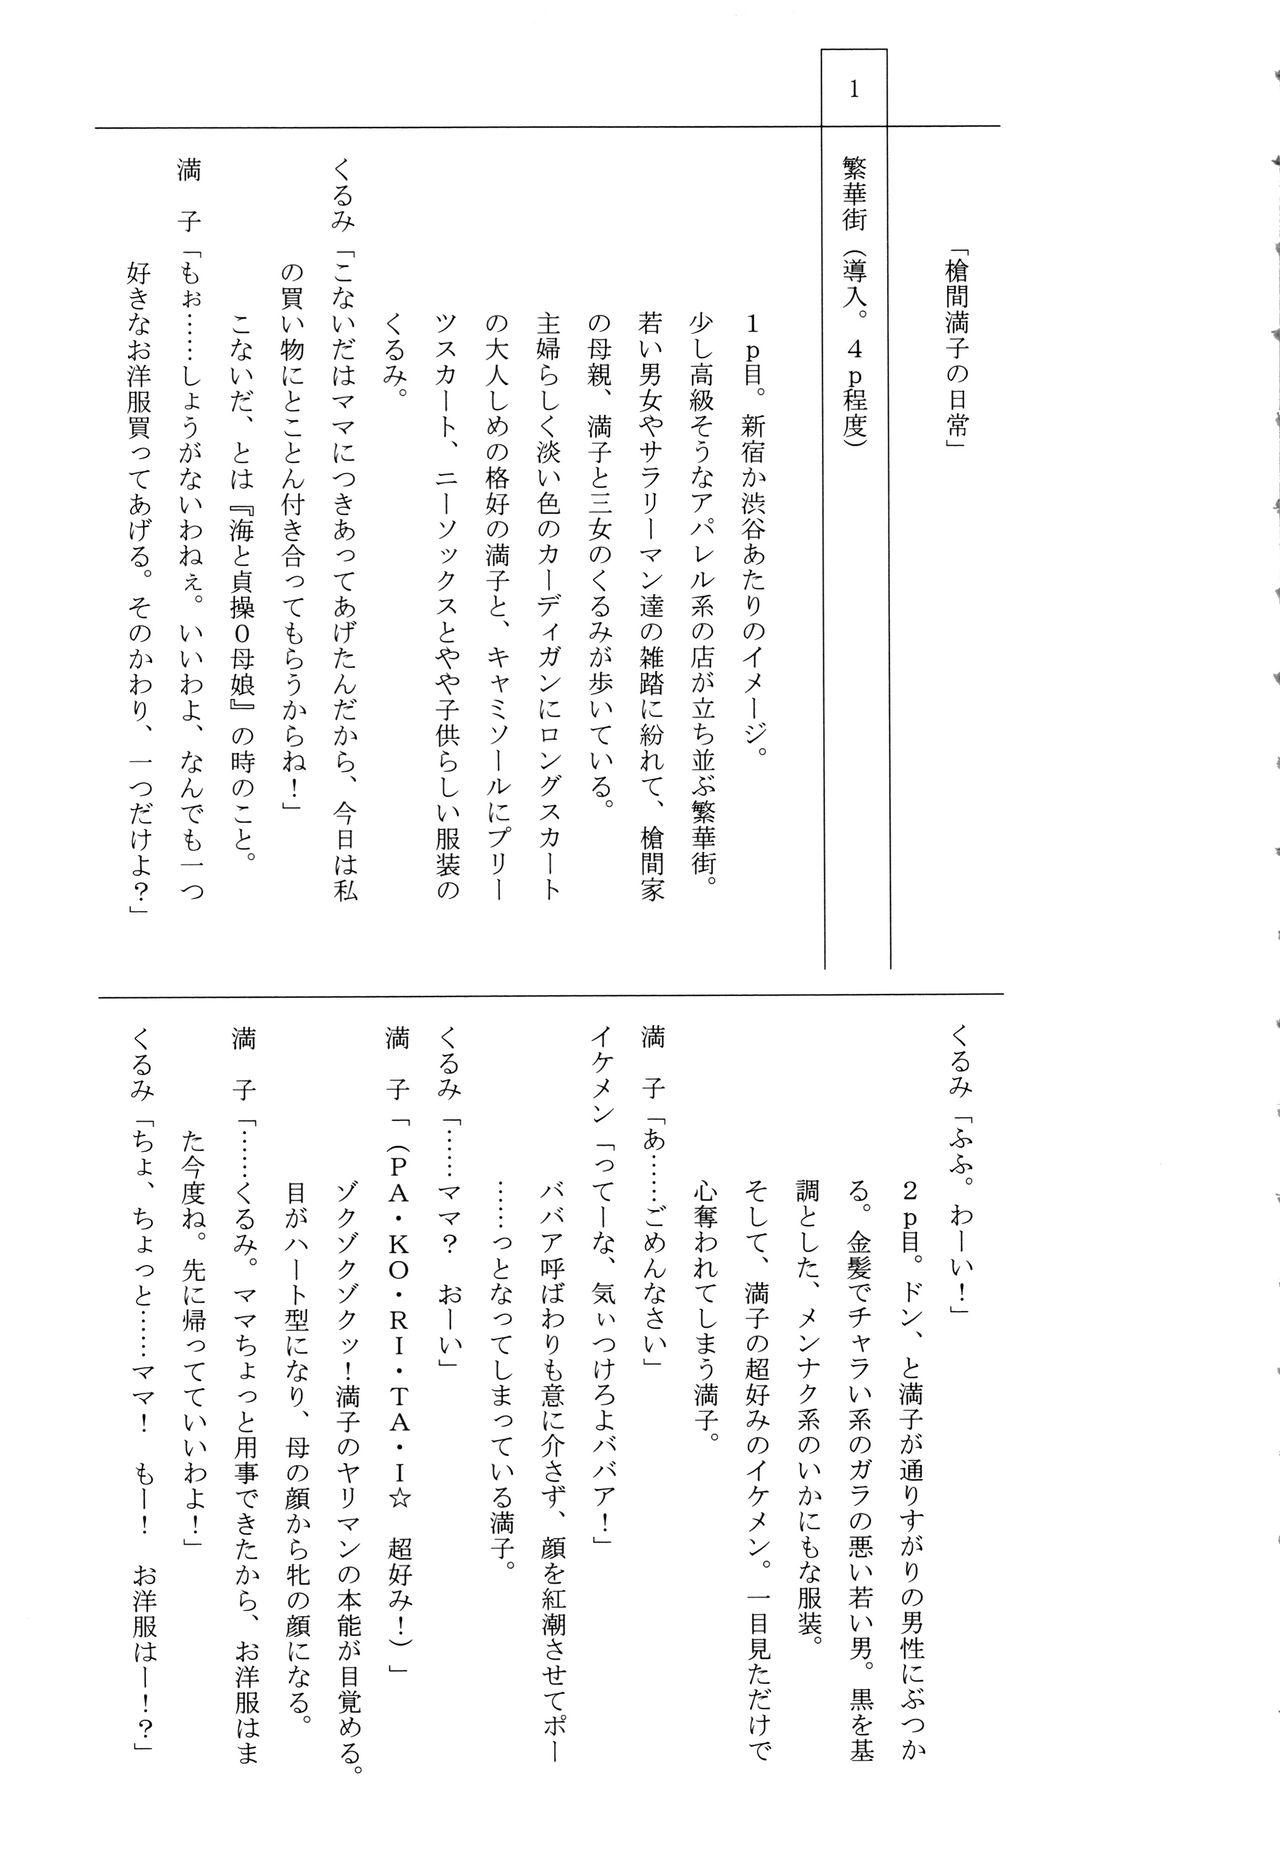 Teisou Kannen ZERO Shinsouban 1 184